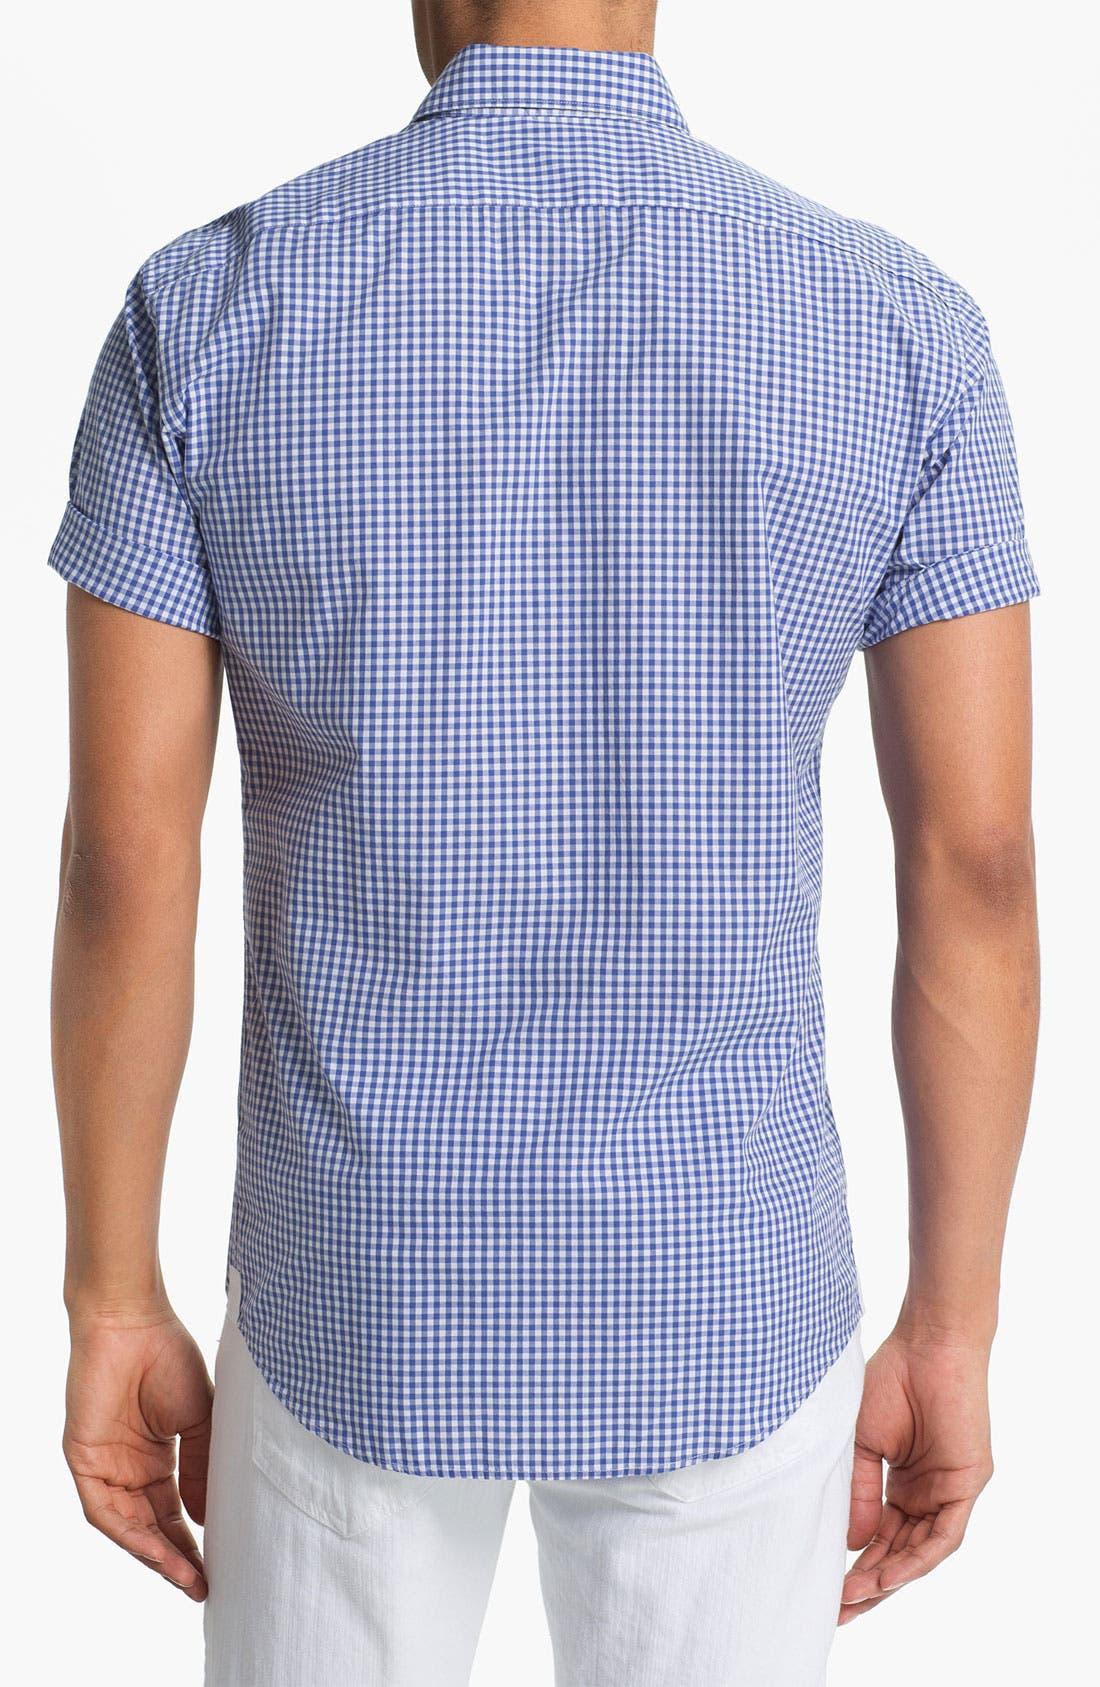 Alternate Image 2  - Lacoste Short Sleeve Button Down Shirt (Big)